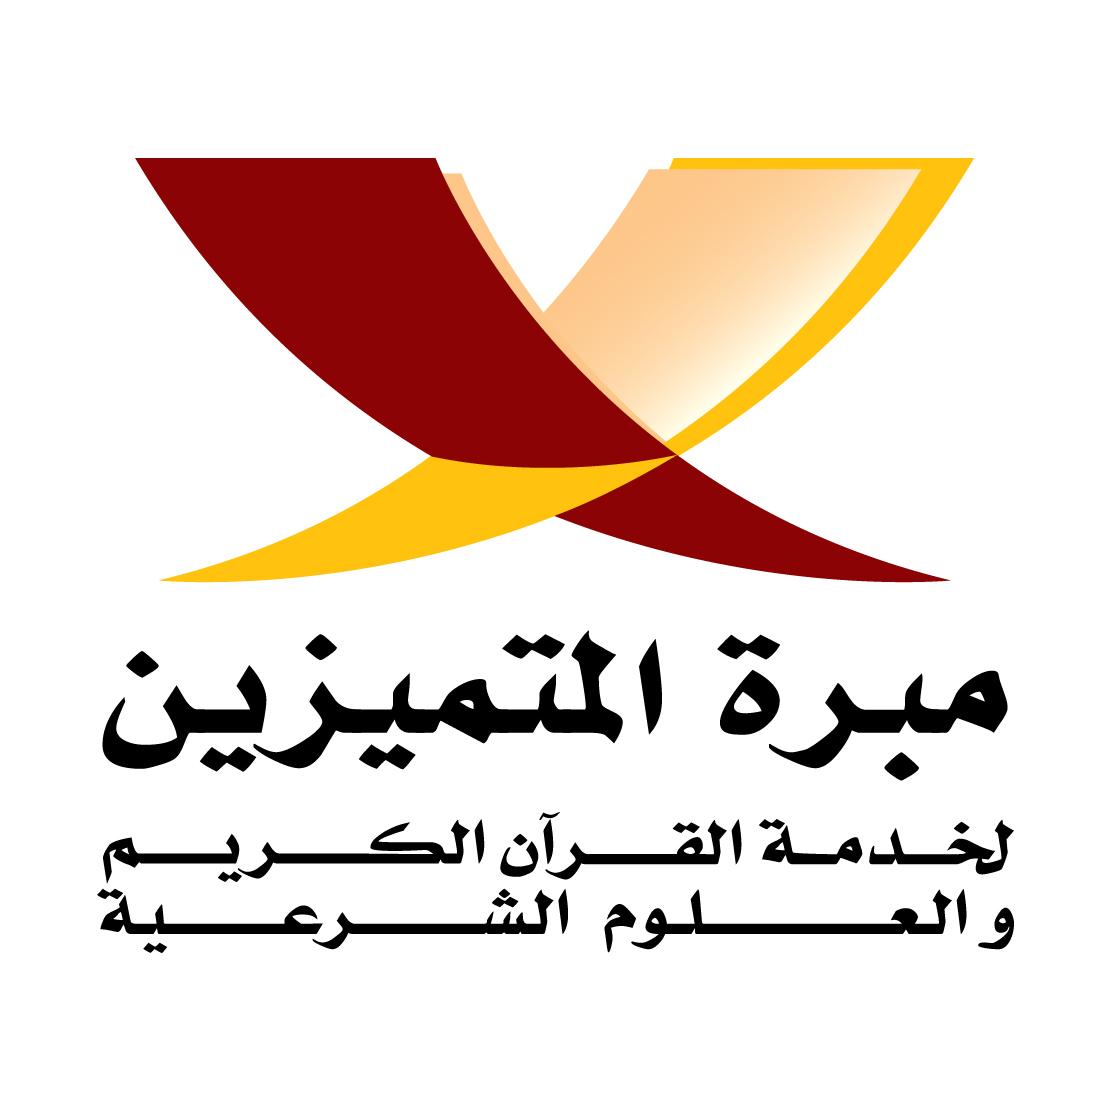 logos-21.jpg